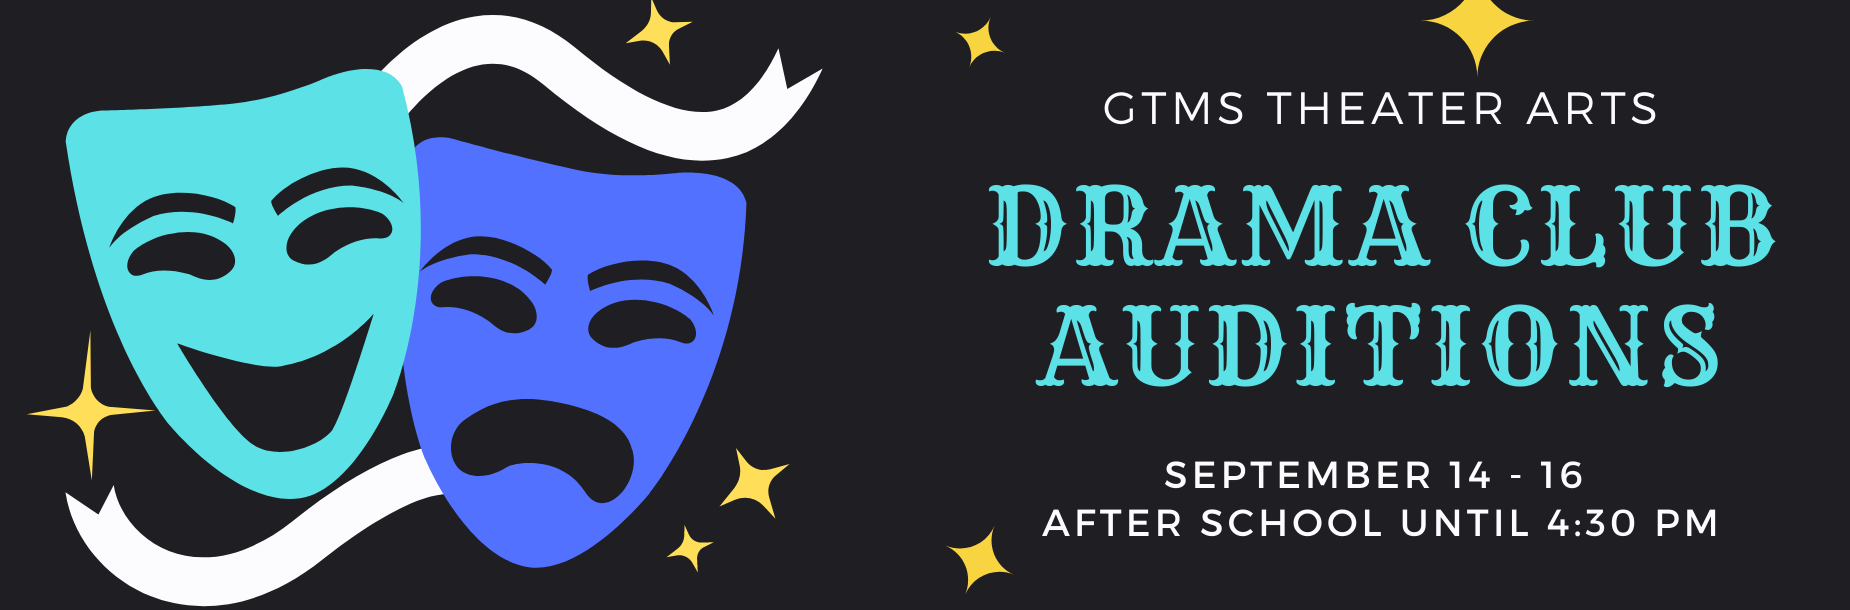 Drama Club Auditions Sep 14-16 until 4:30pm